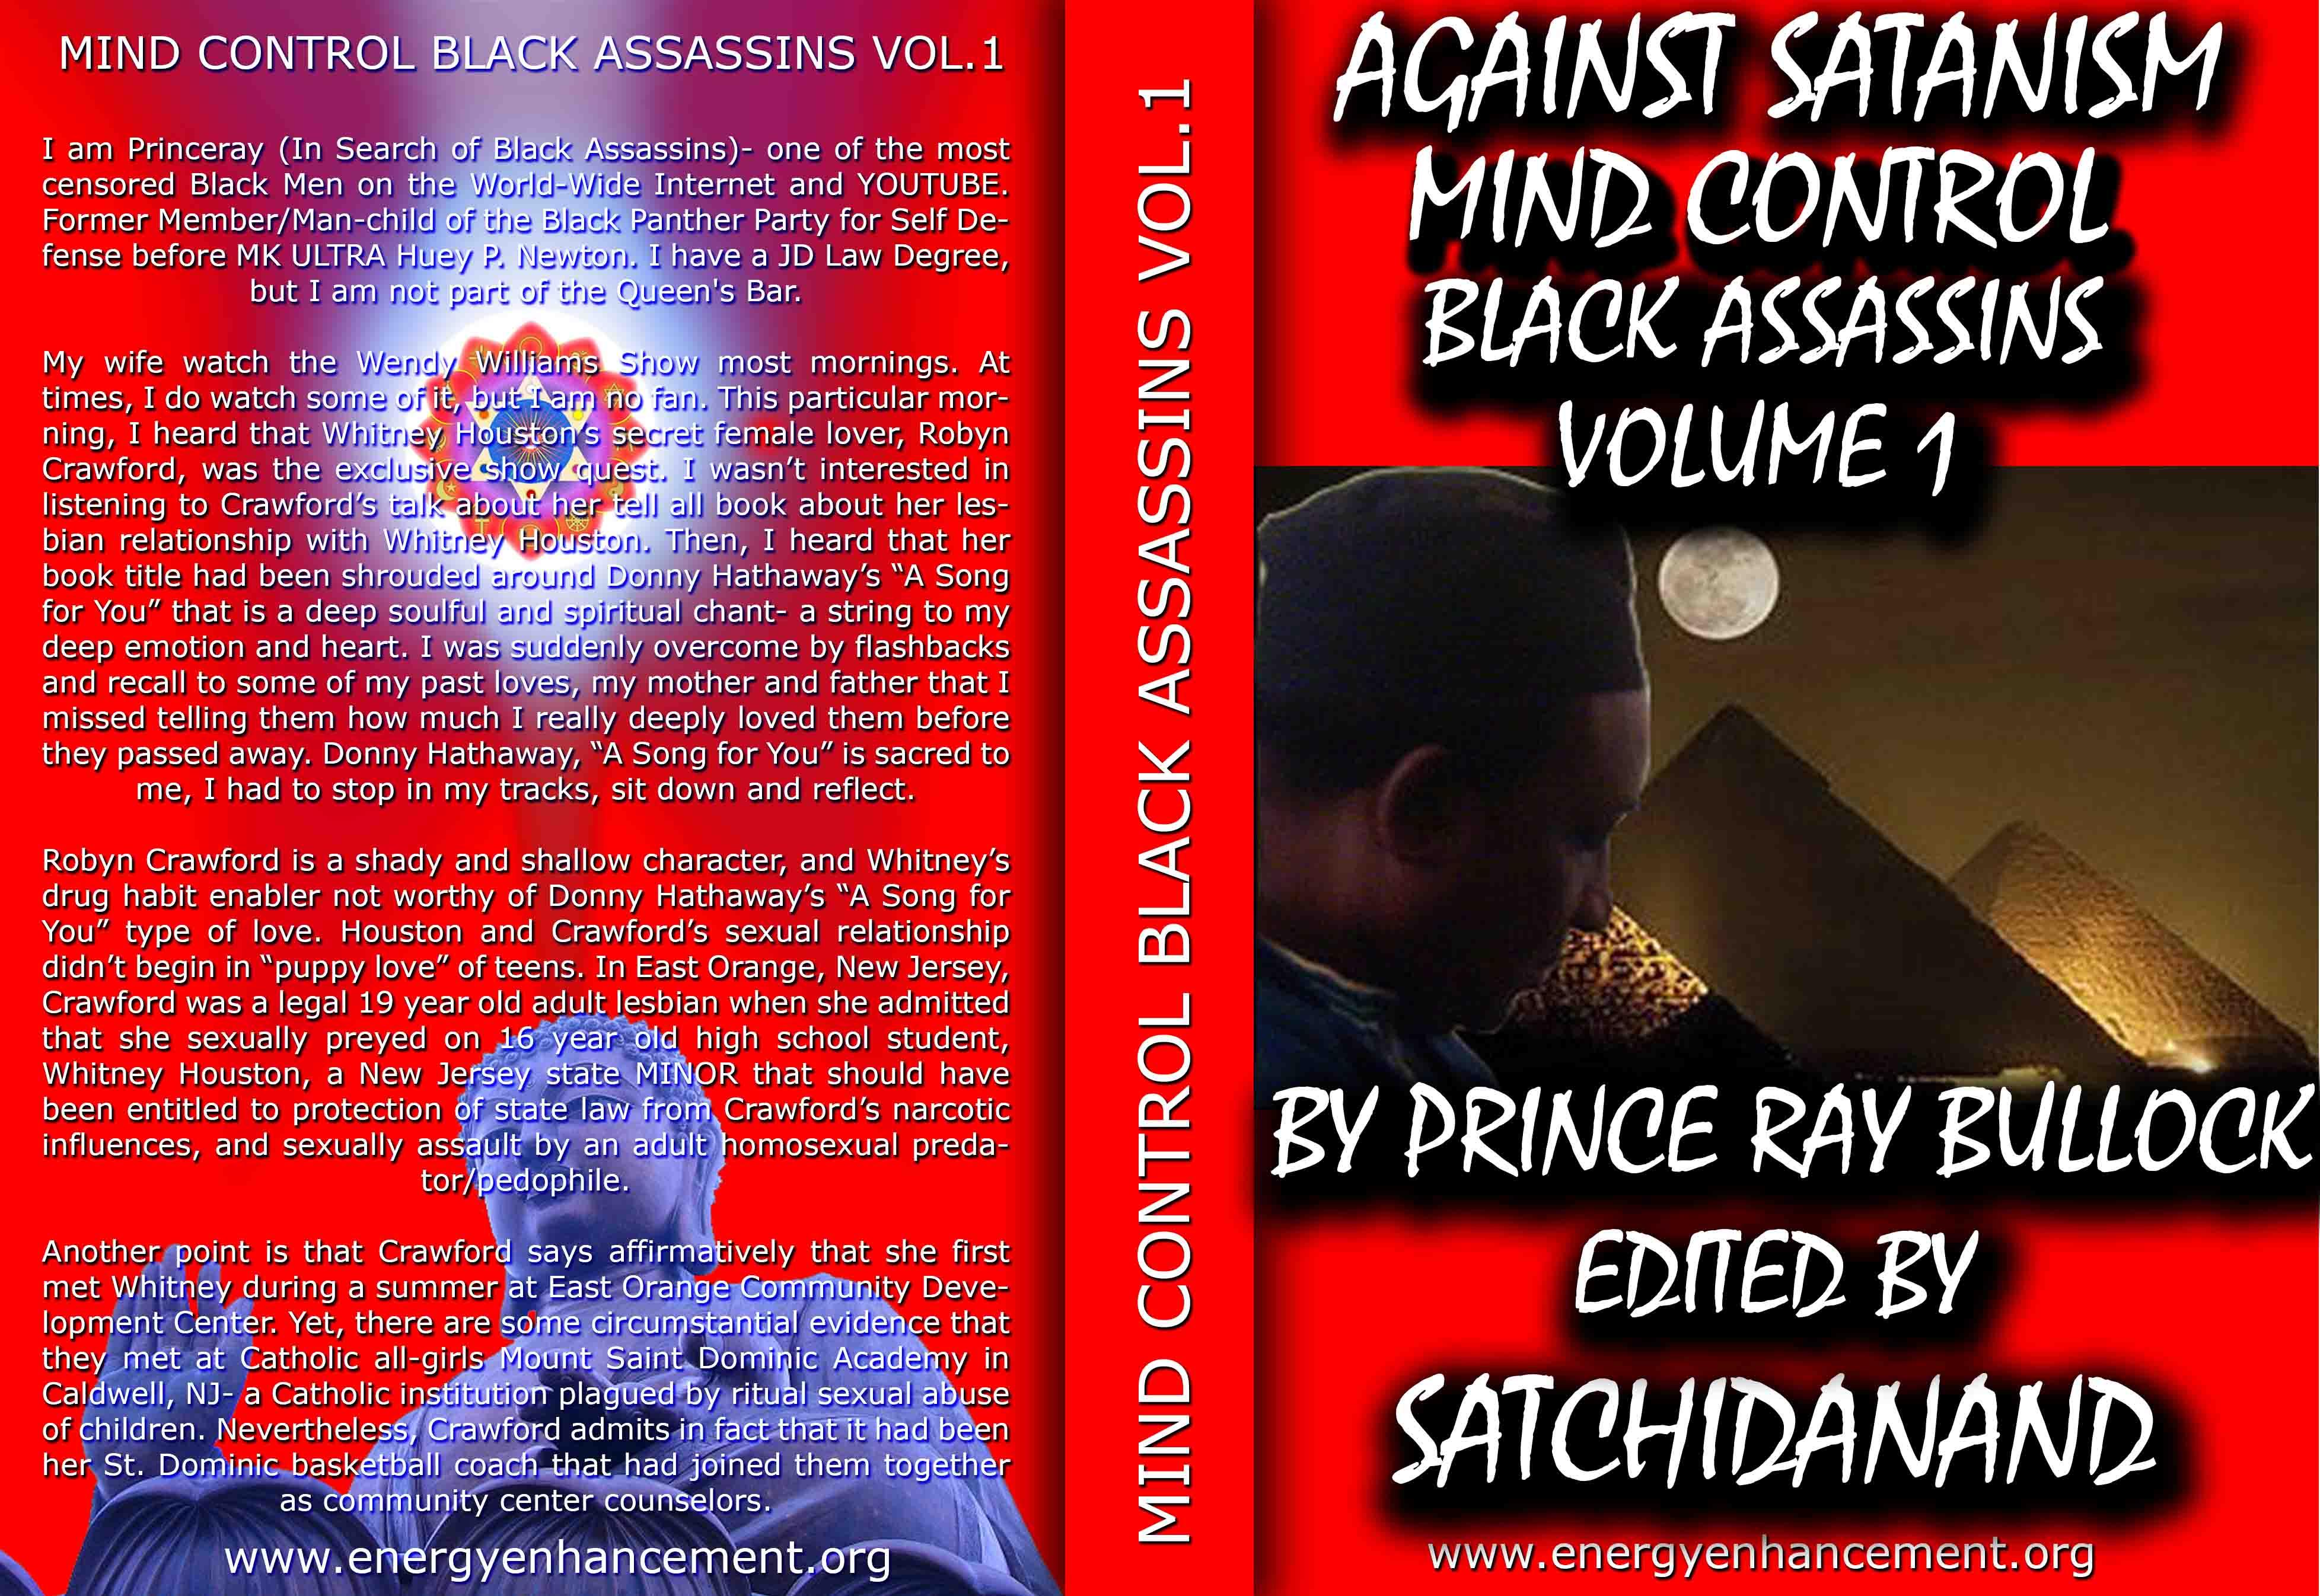 Description: Description: C:\wnew\Sacred-Energy\Black-Assassins-1\full.jpg